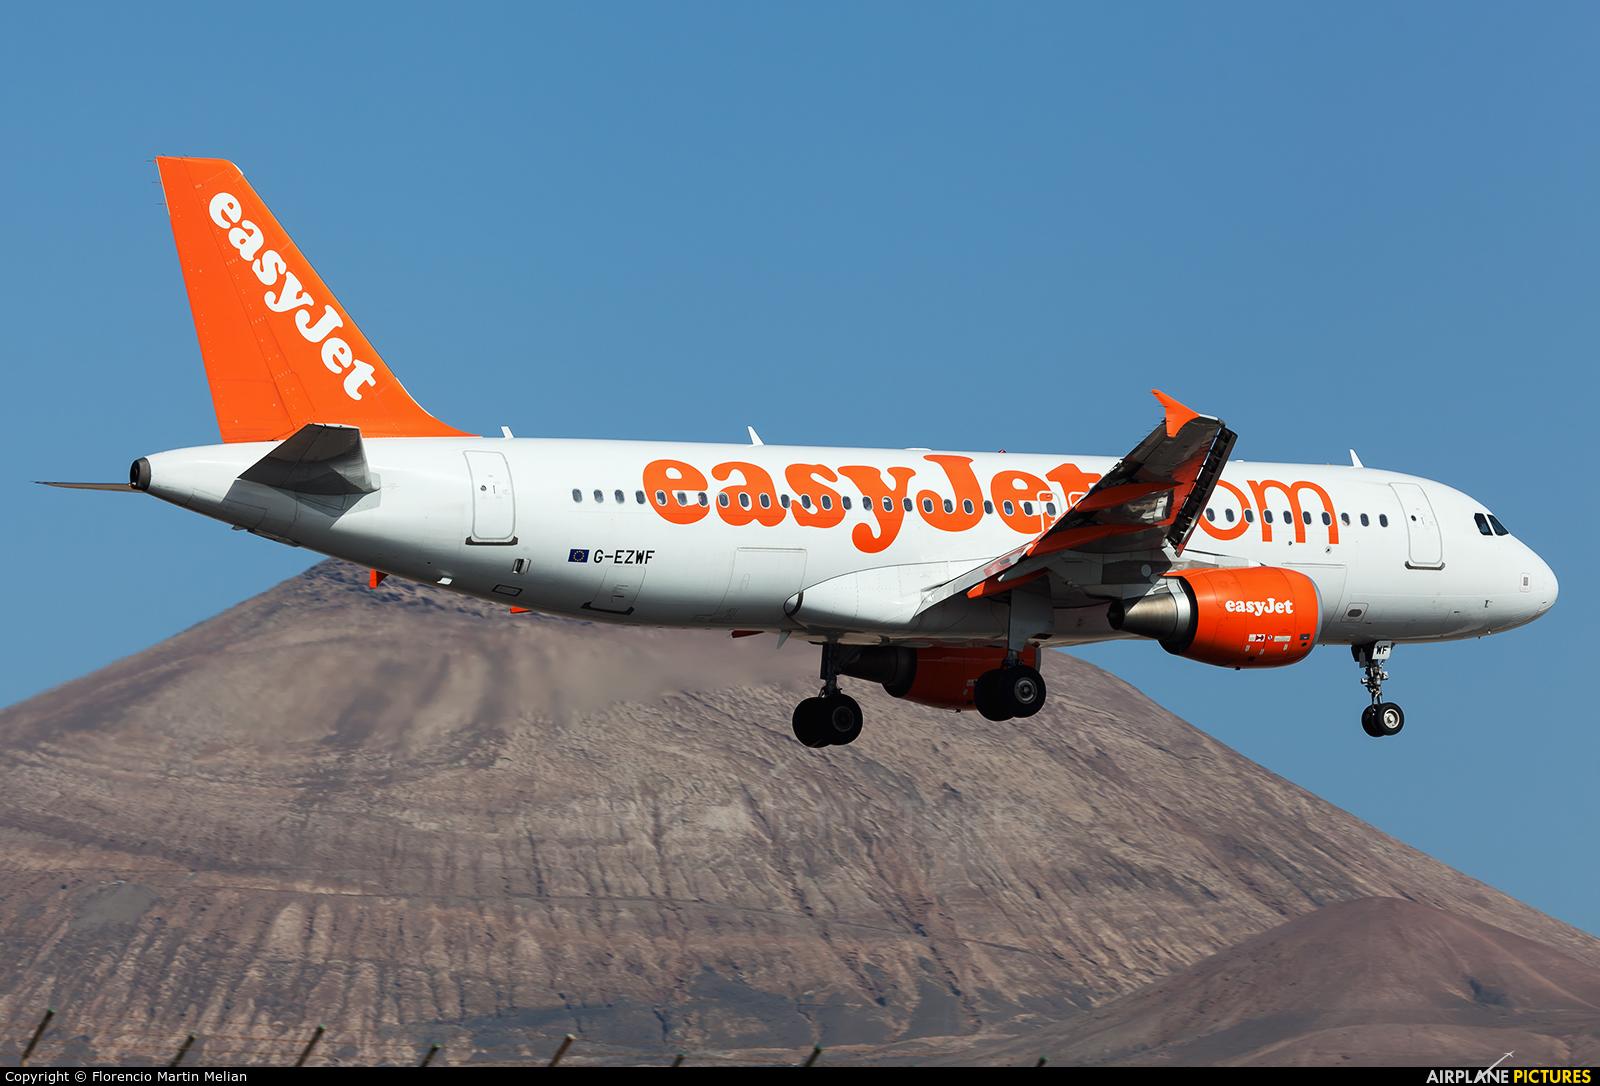 easyJet G-EZWF aircraft at Lanzarote - Arrecife